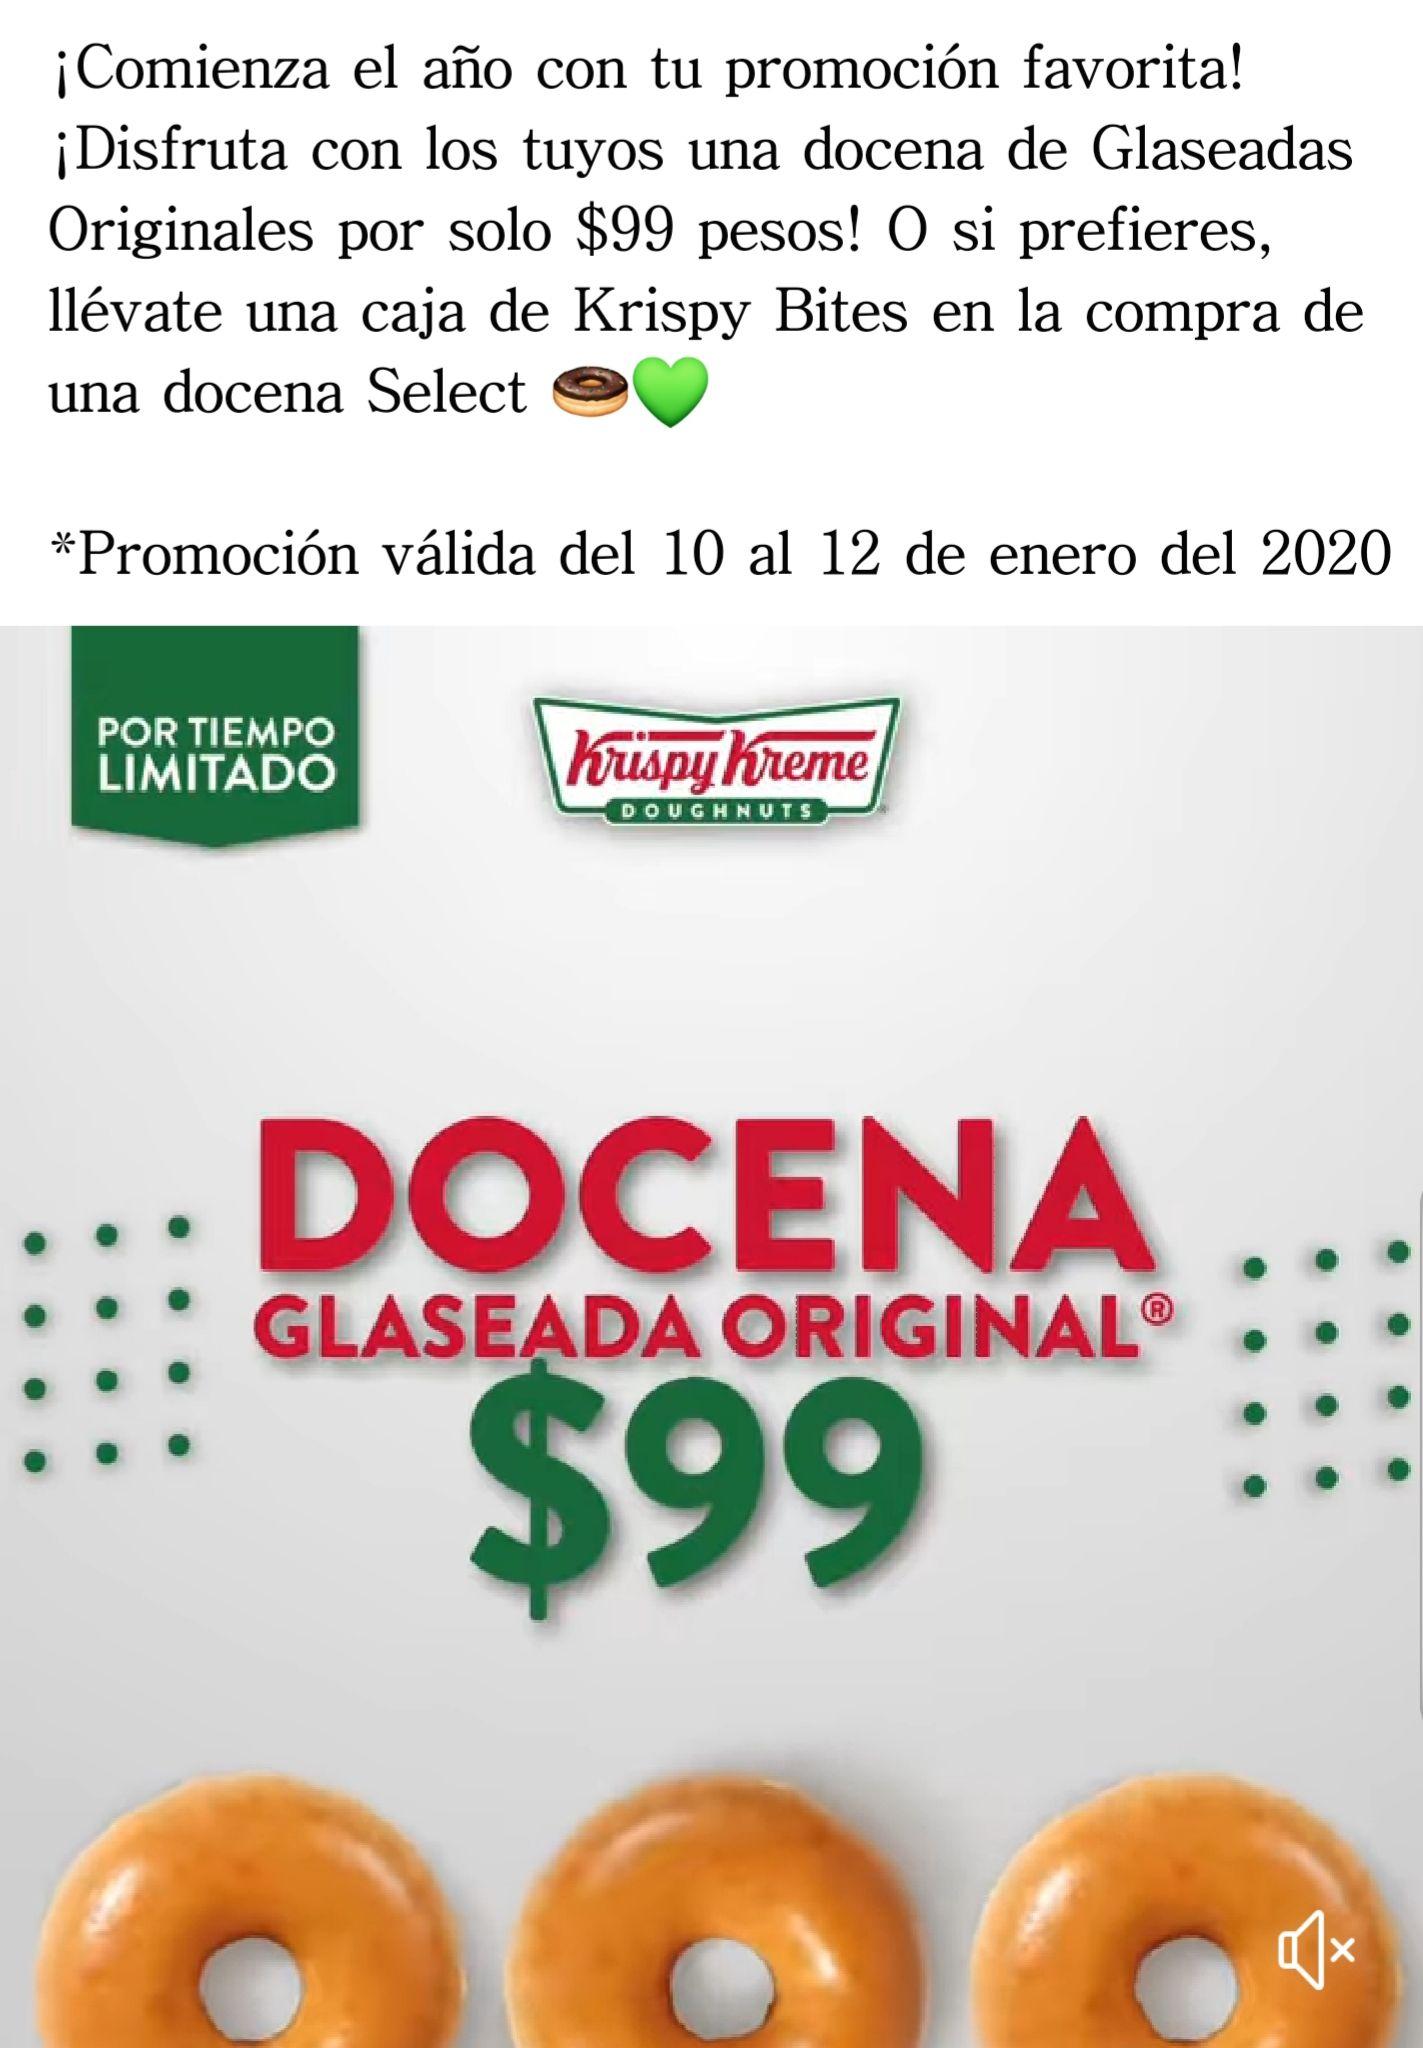 Krispy Kreme Fin de semana de donas a $99